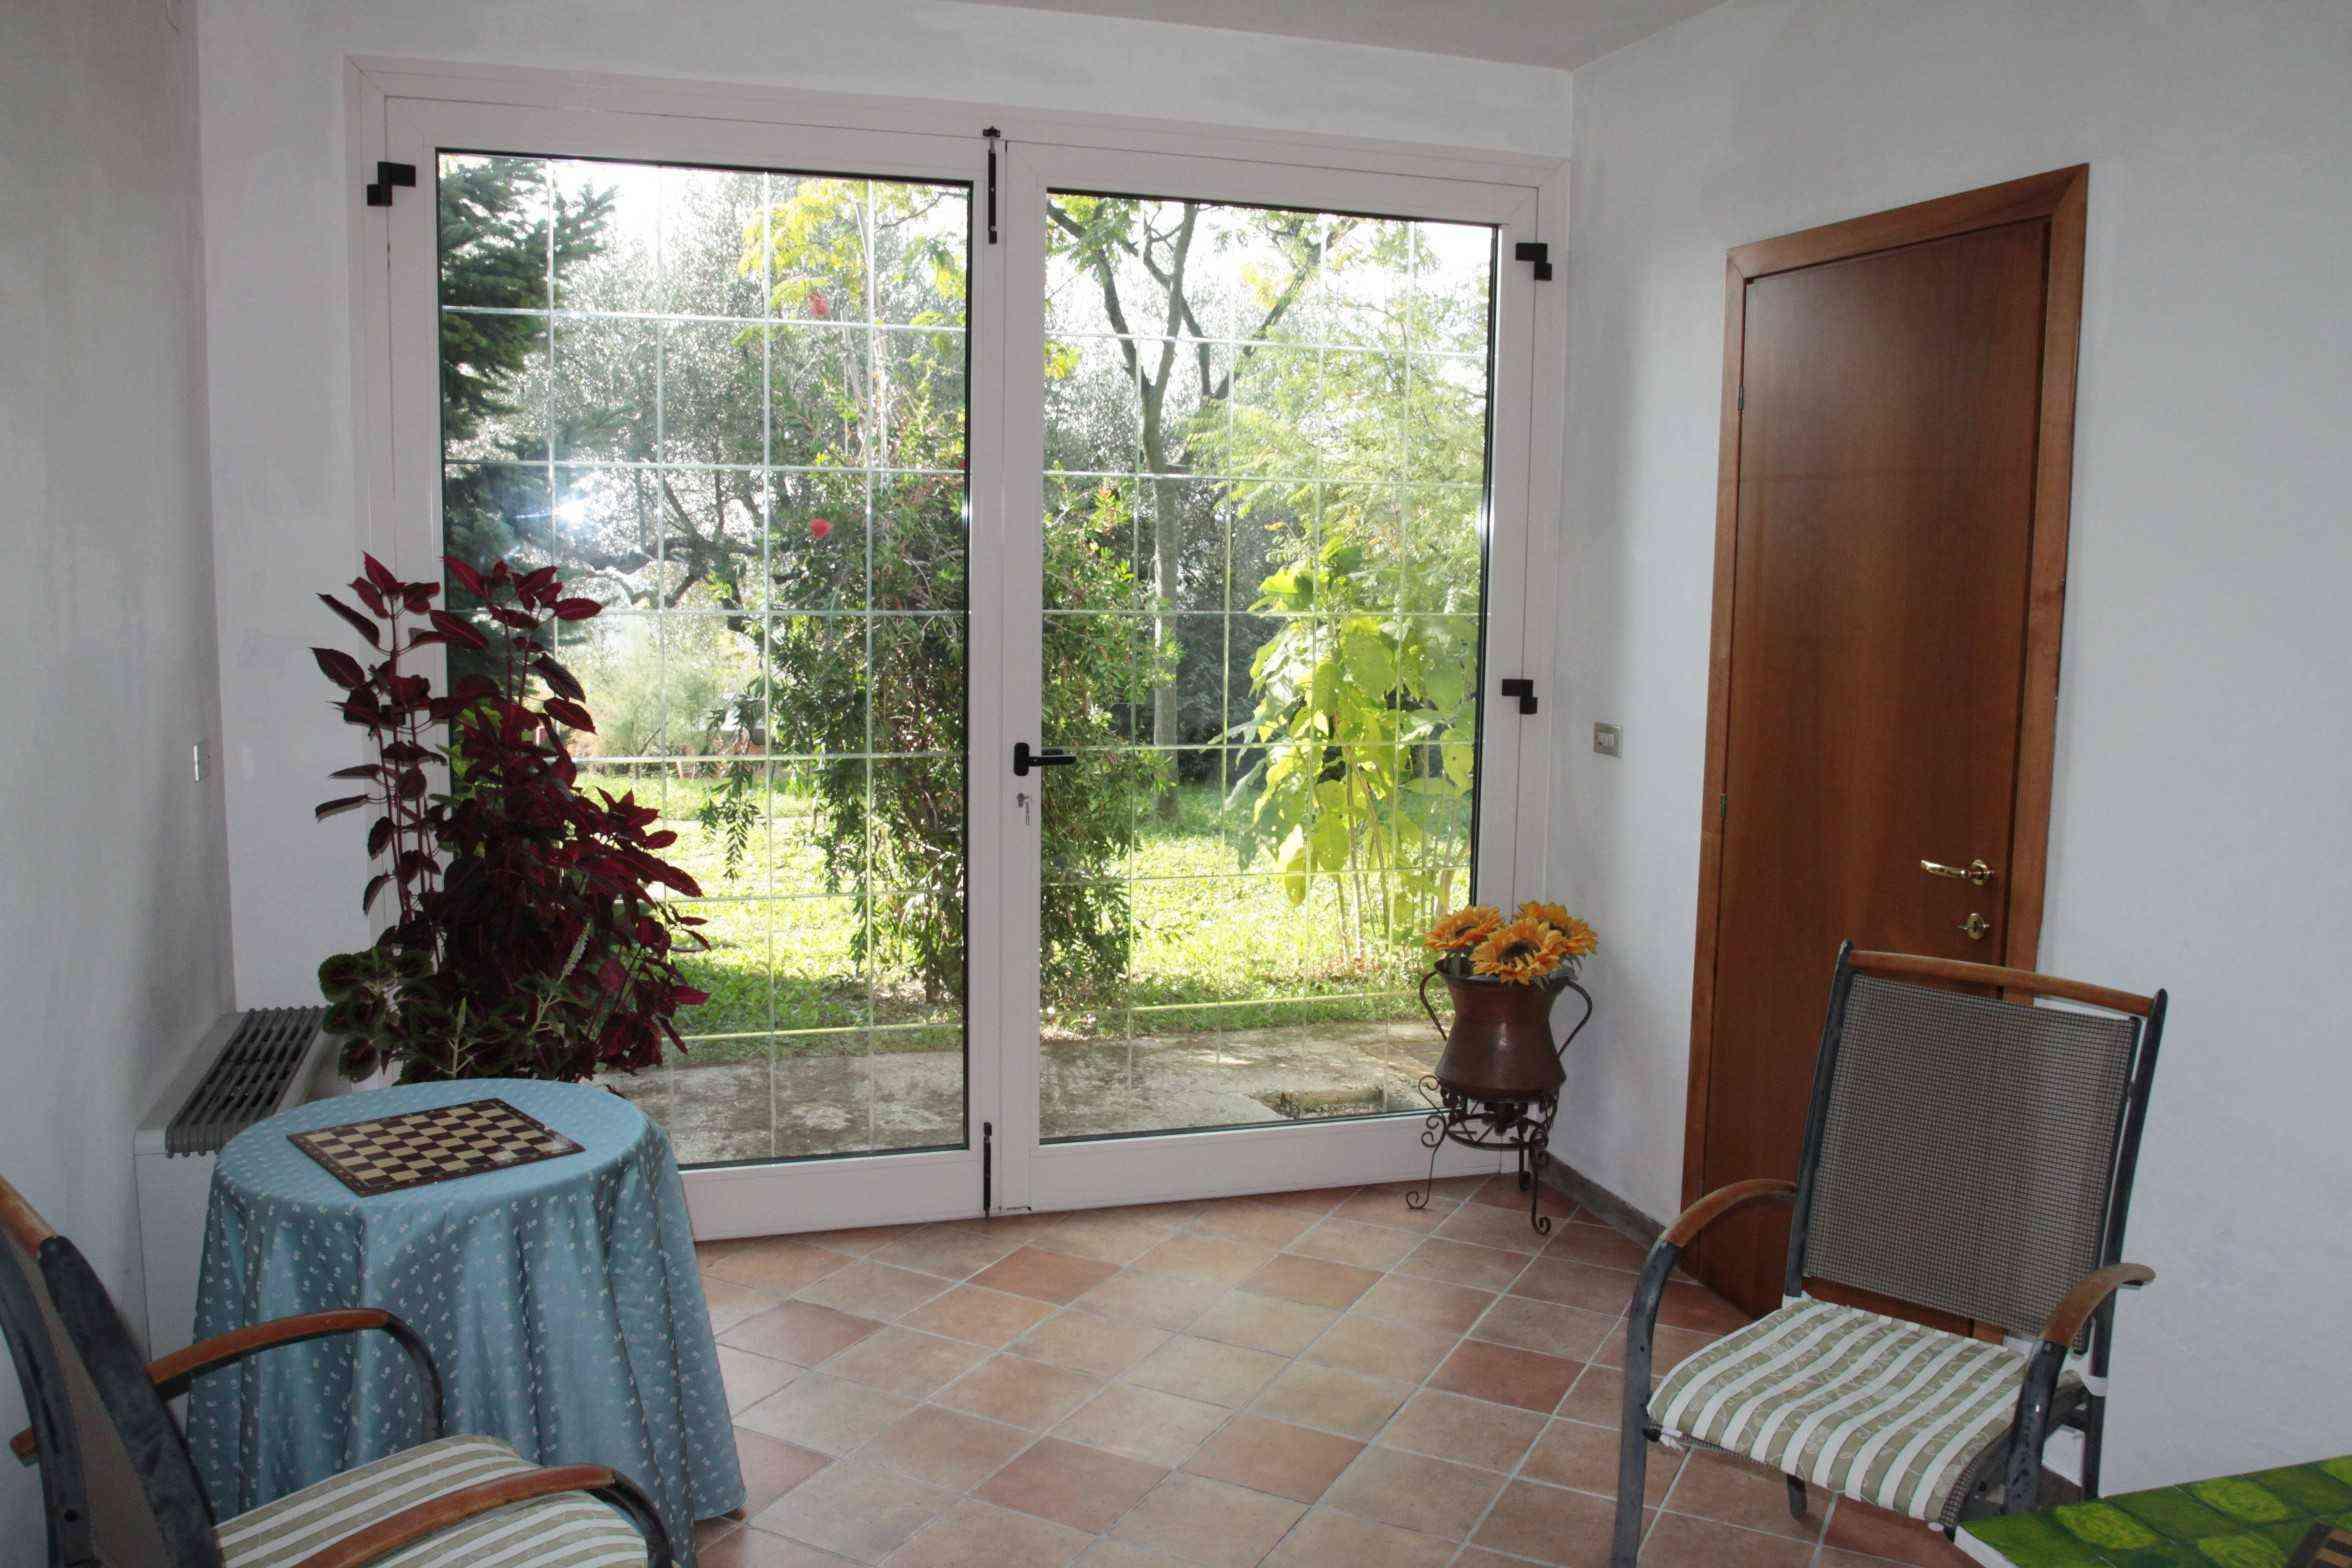 Villa Villa in vendita Atri (TE), Villa Paola - Atri - EUR 473.281 150